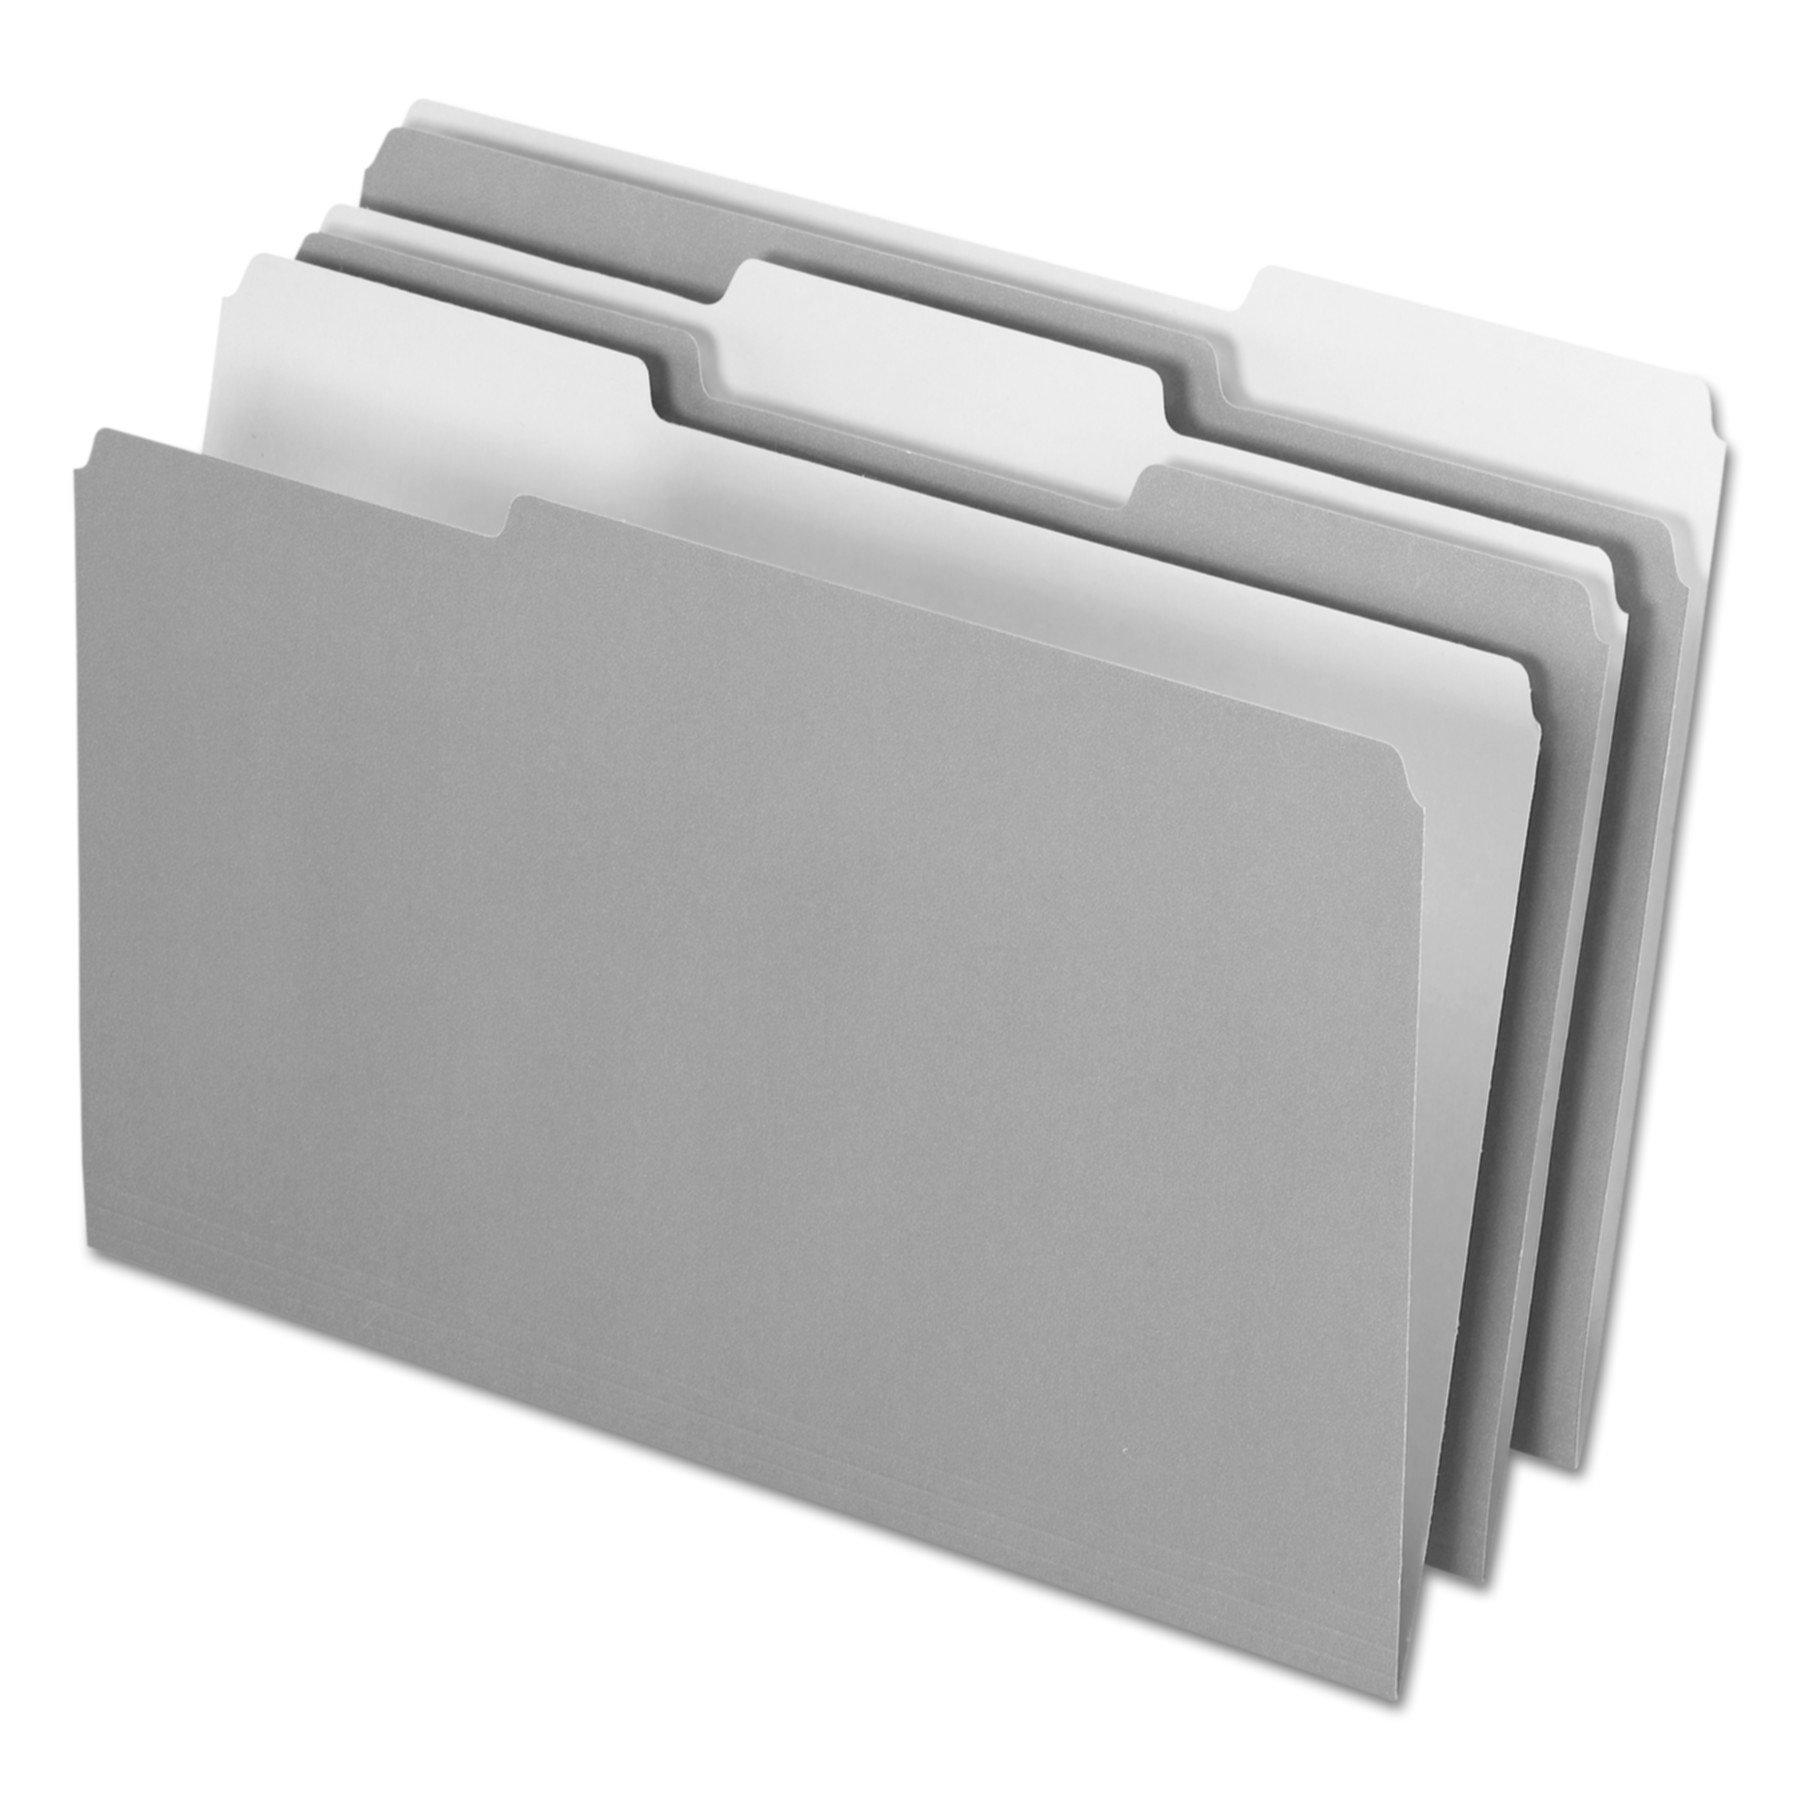 Pendaflex 435013GRA Interior File Folders, 1/3 Cut Top Tab, Legal, Gray (Box of 100) by Pendaflex